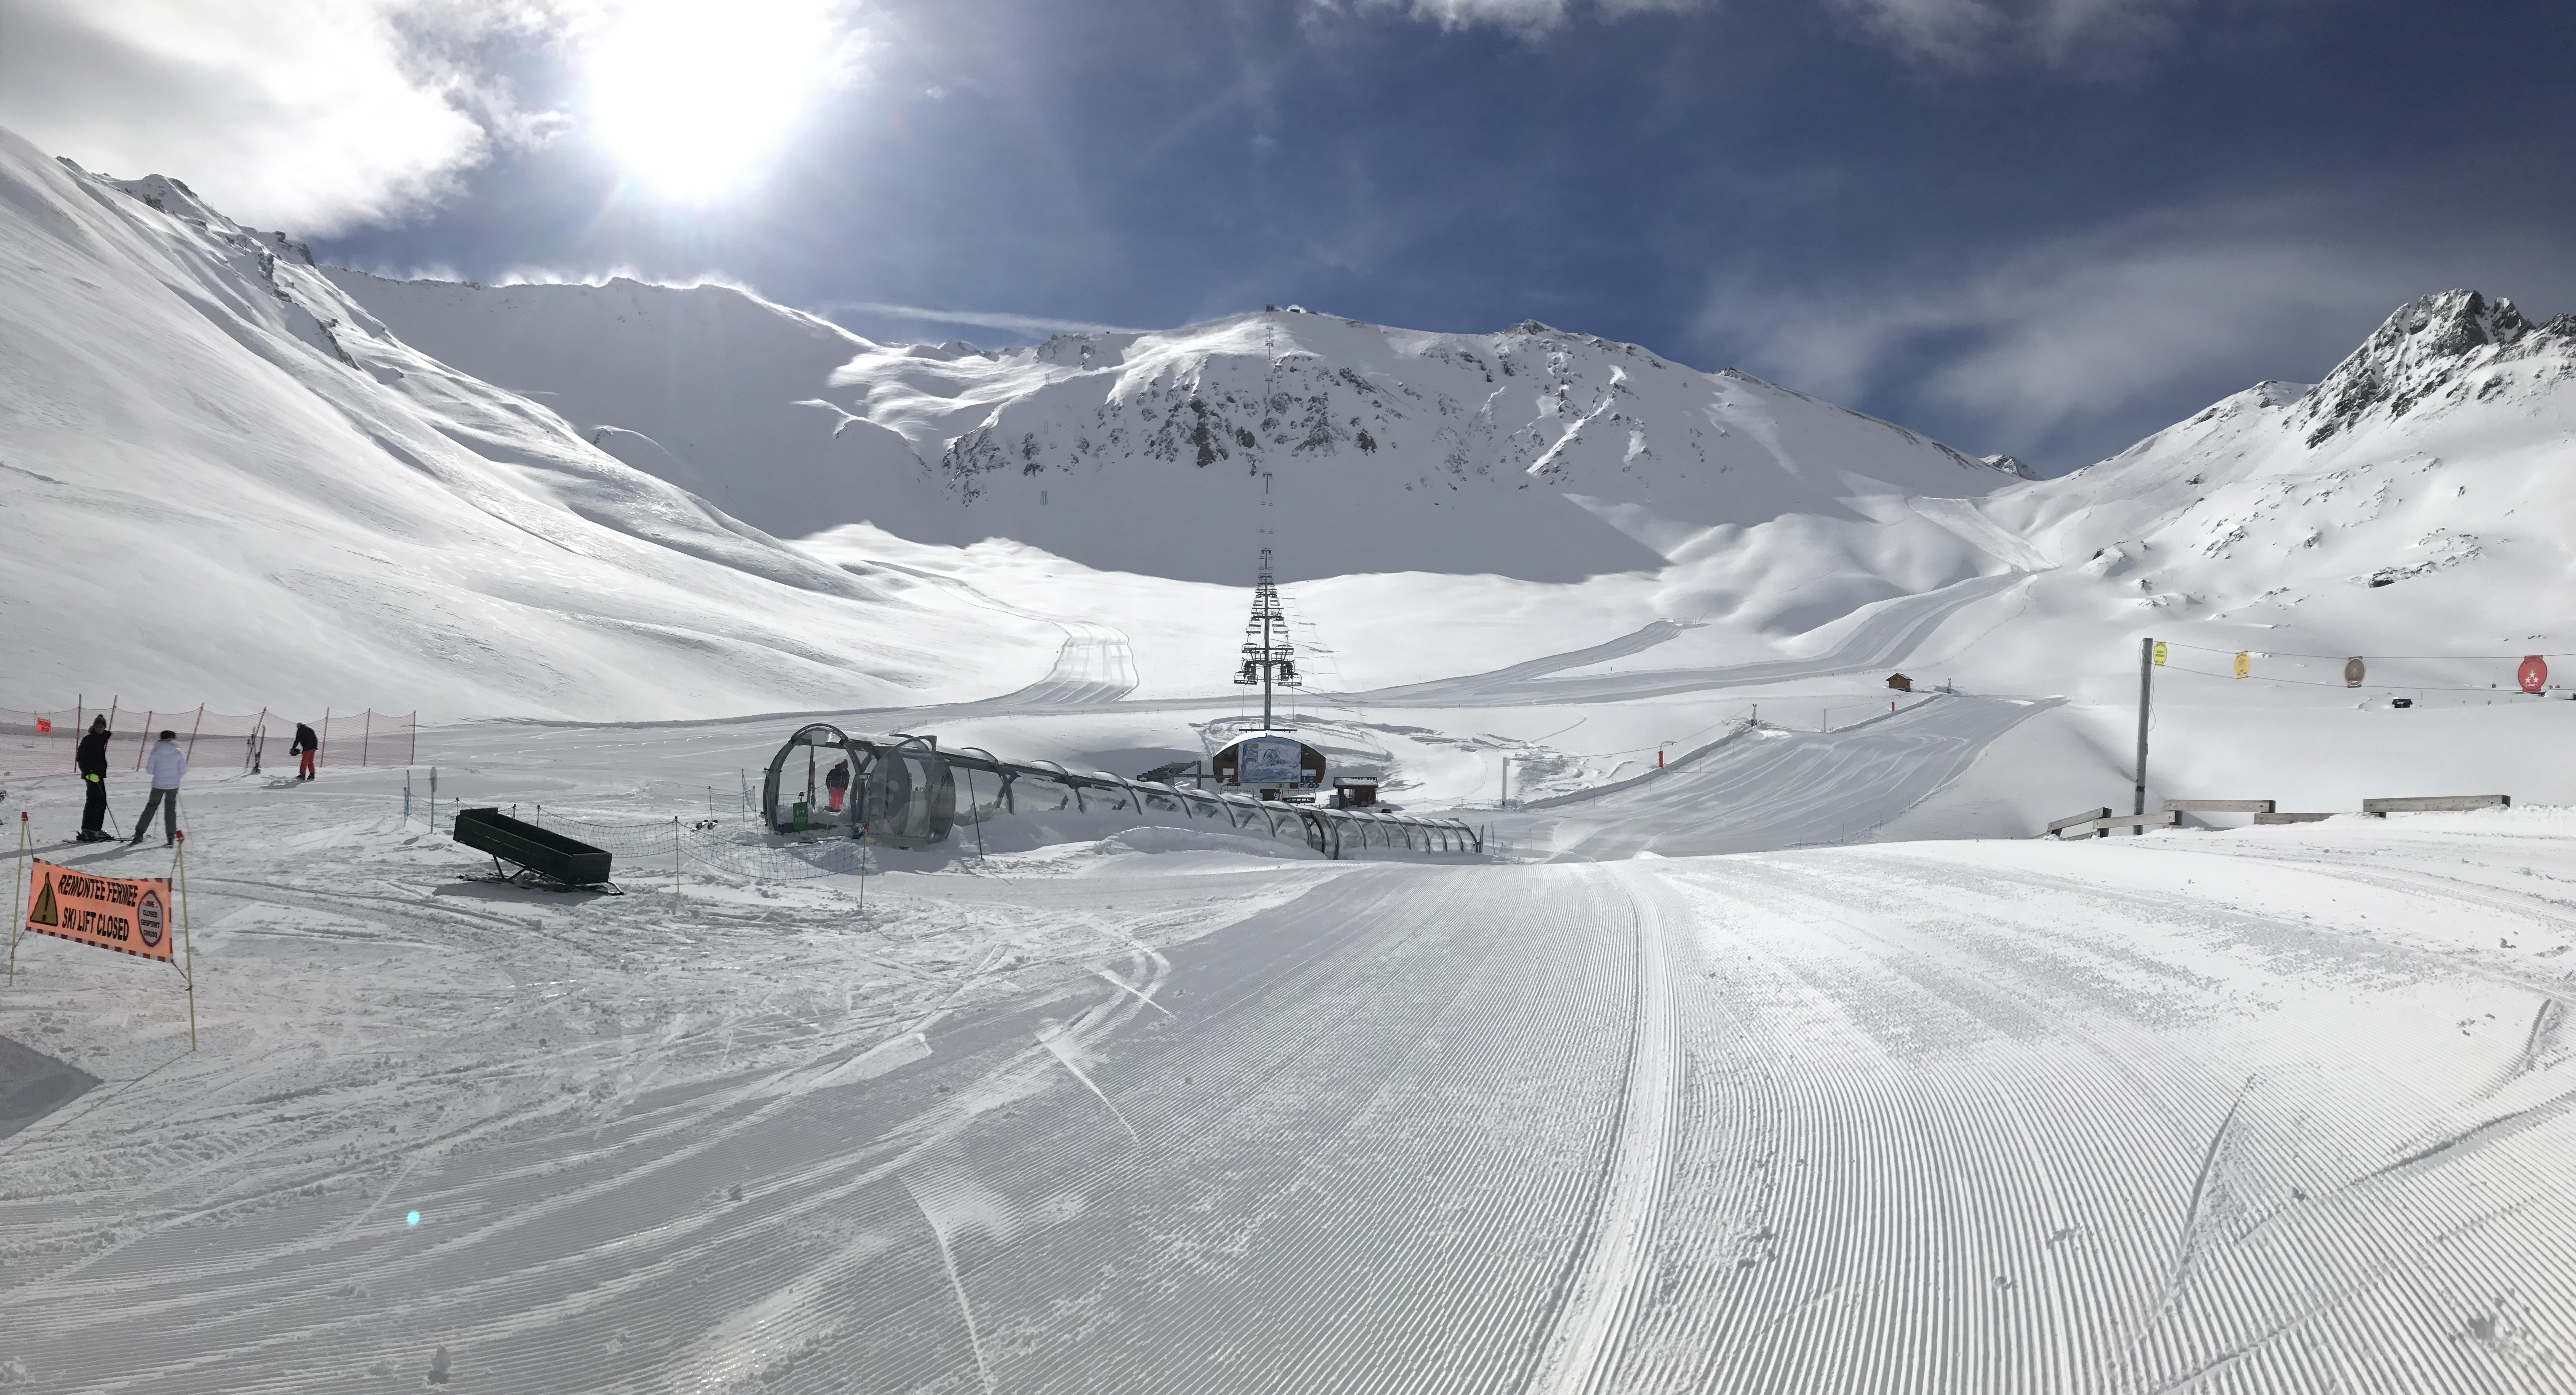 Domaine skiable valfréjus